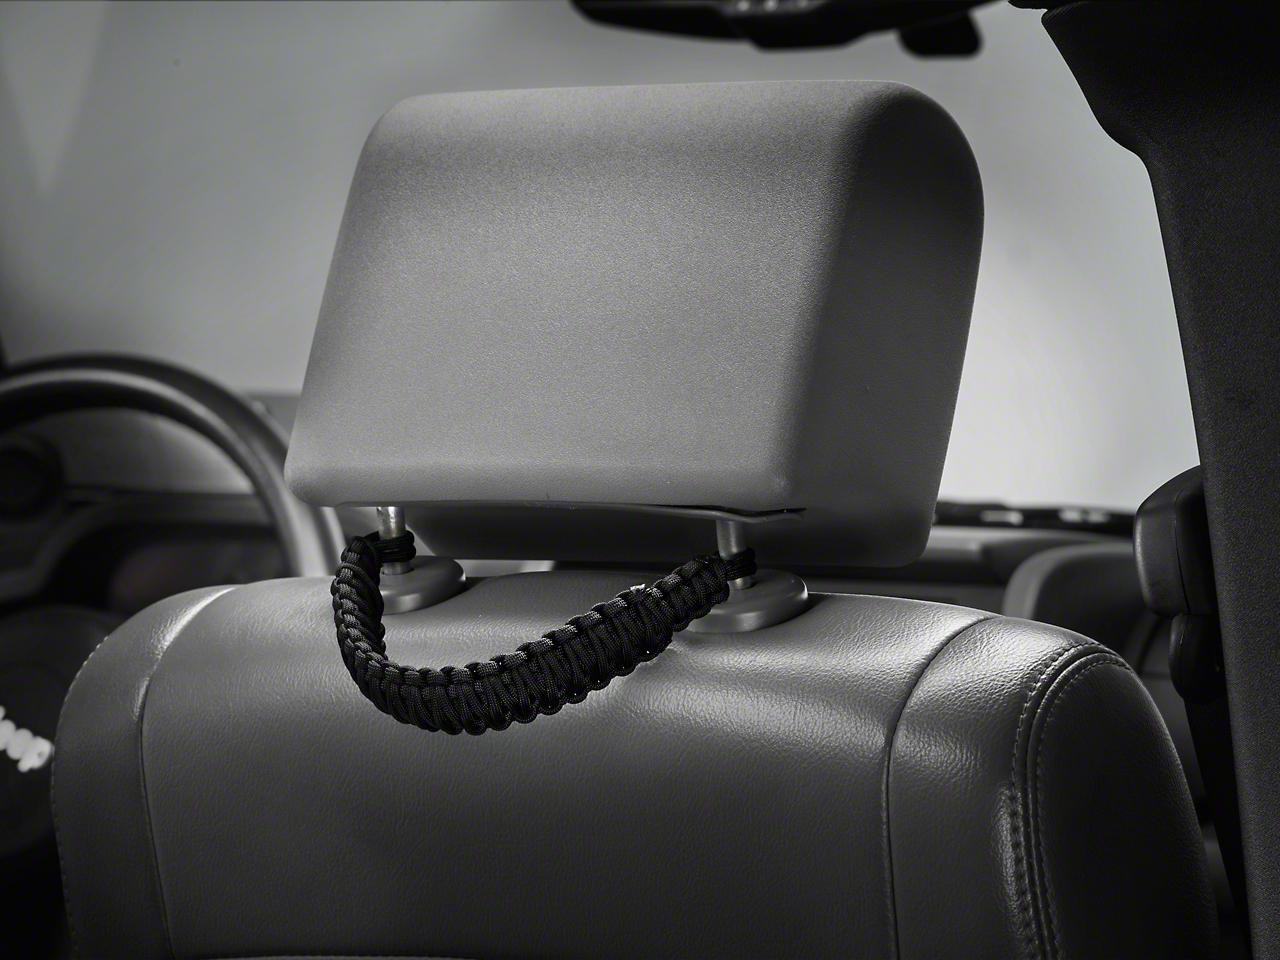 RedRock 4x4 Headrest Paracord Grab Handles - Black (07-18 Jeep Wrangler JK; 2018 Jeep Wrangler JL)